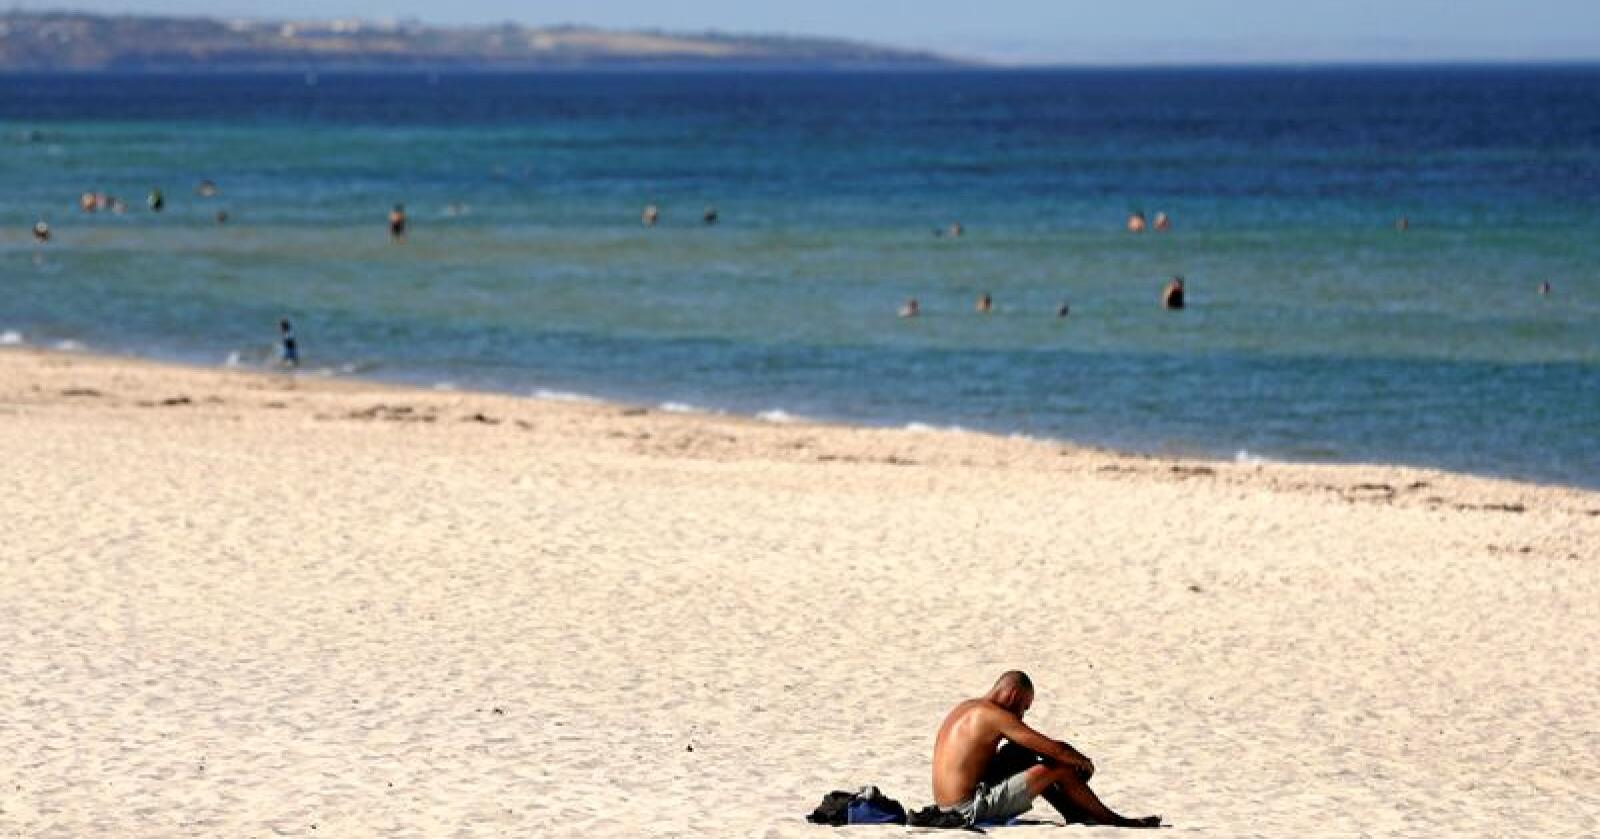 Varmt: Adelaide satte ny varmerekord for en australsk storby med 46,6 grader celsius i skyggen i januar i år. Varmebølger og ekstremvær har satt fart i klimadebatten i Australia. Foto: Kelly Barnes / AAP Image / AP / NTB Scanpix